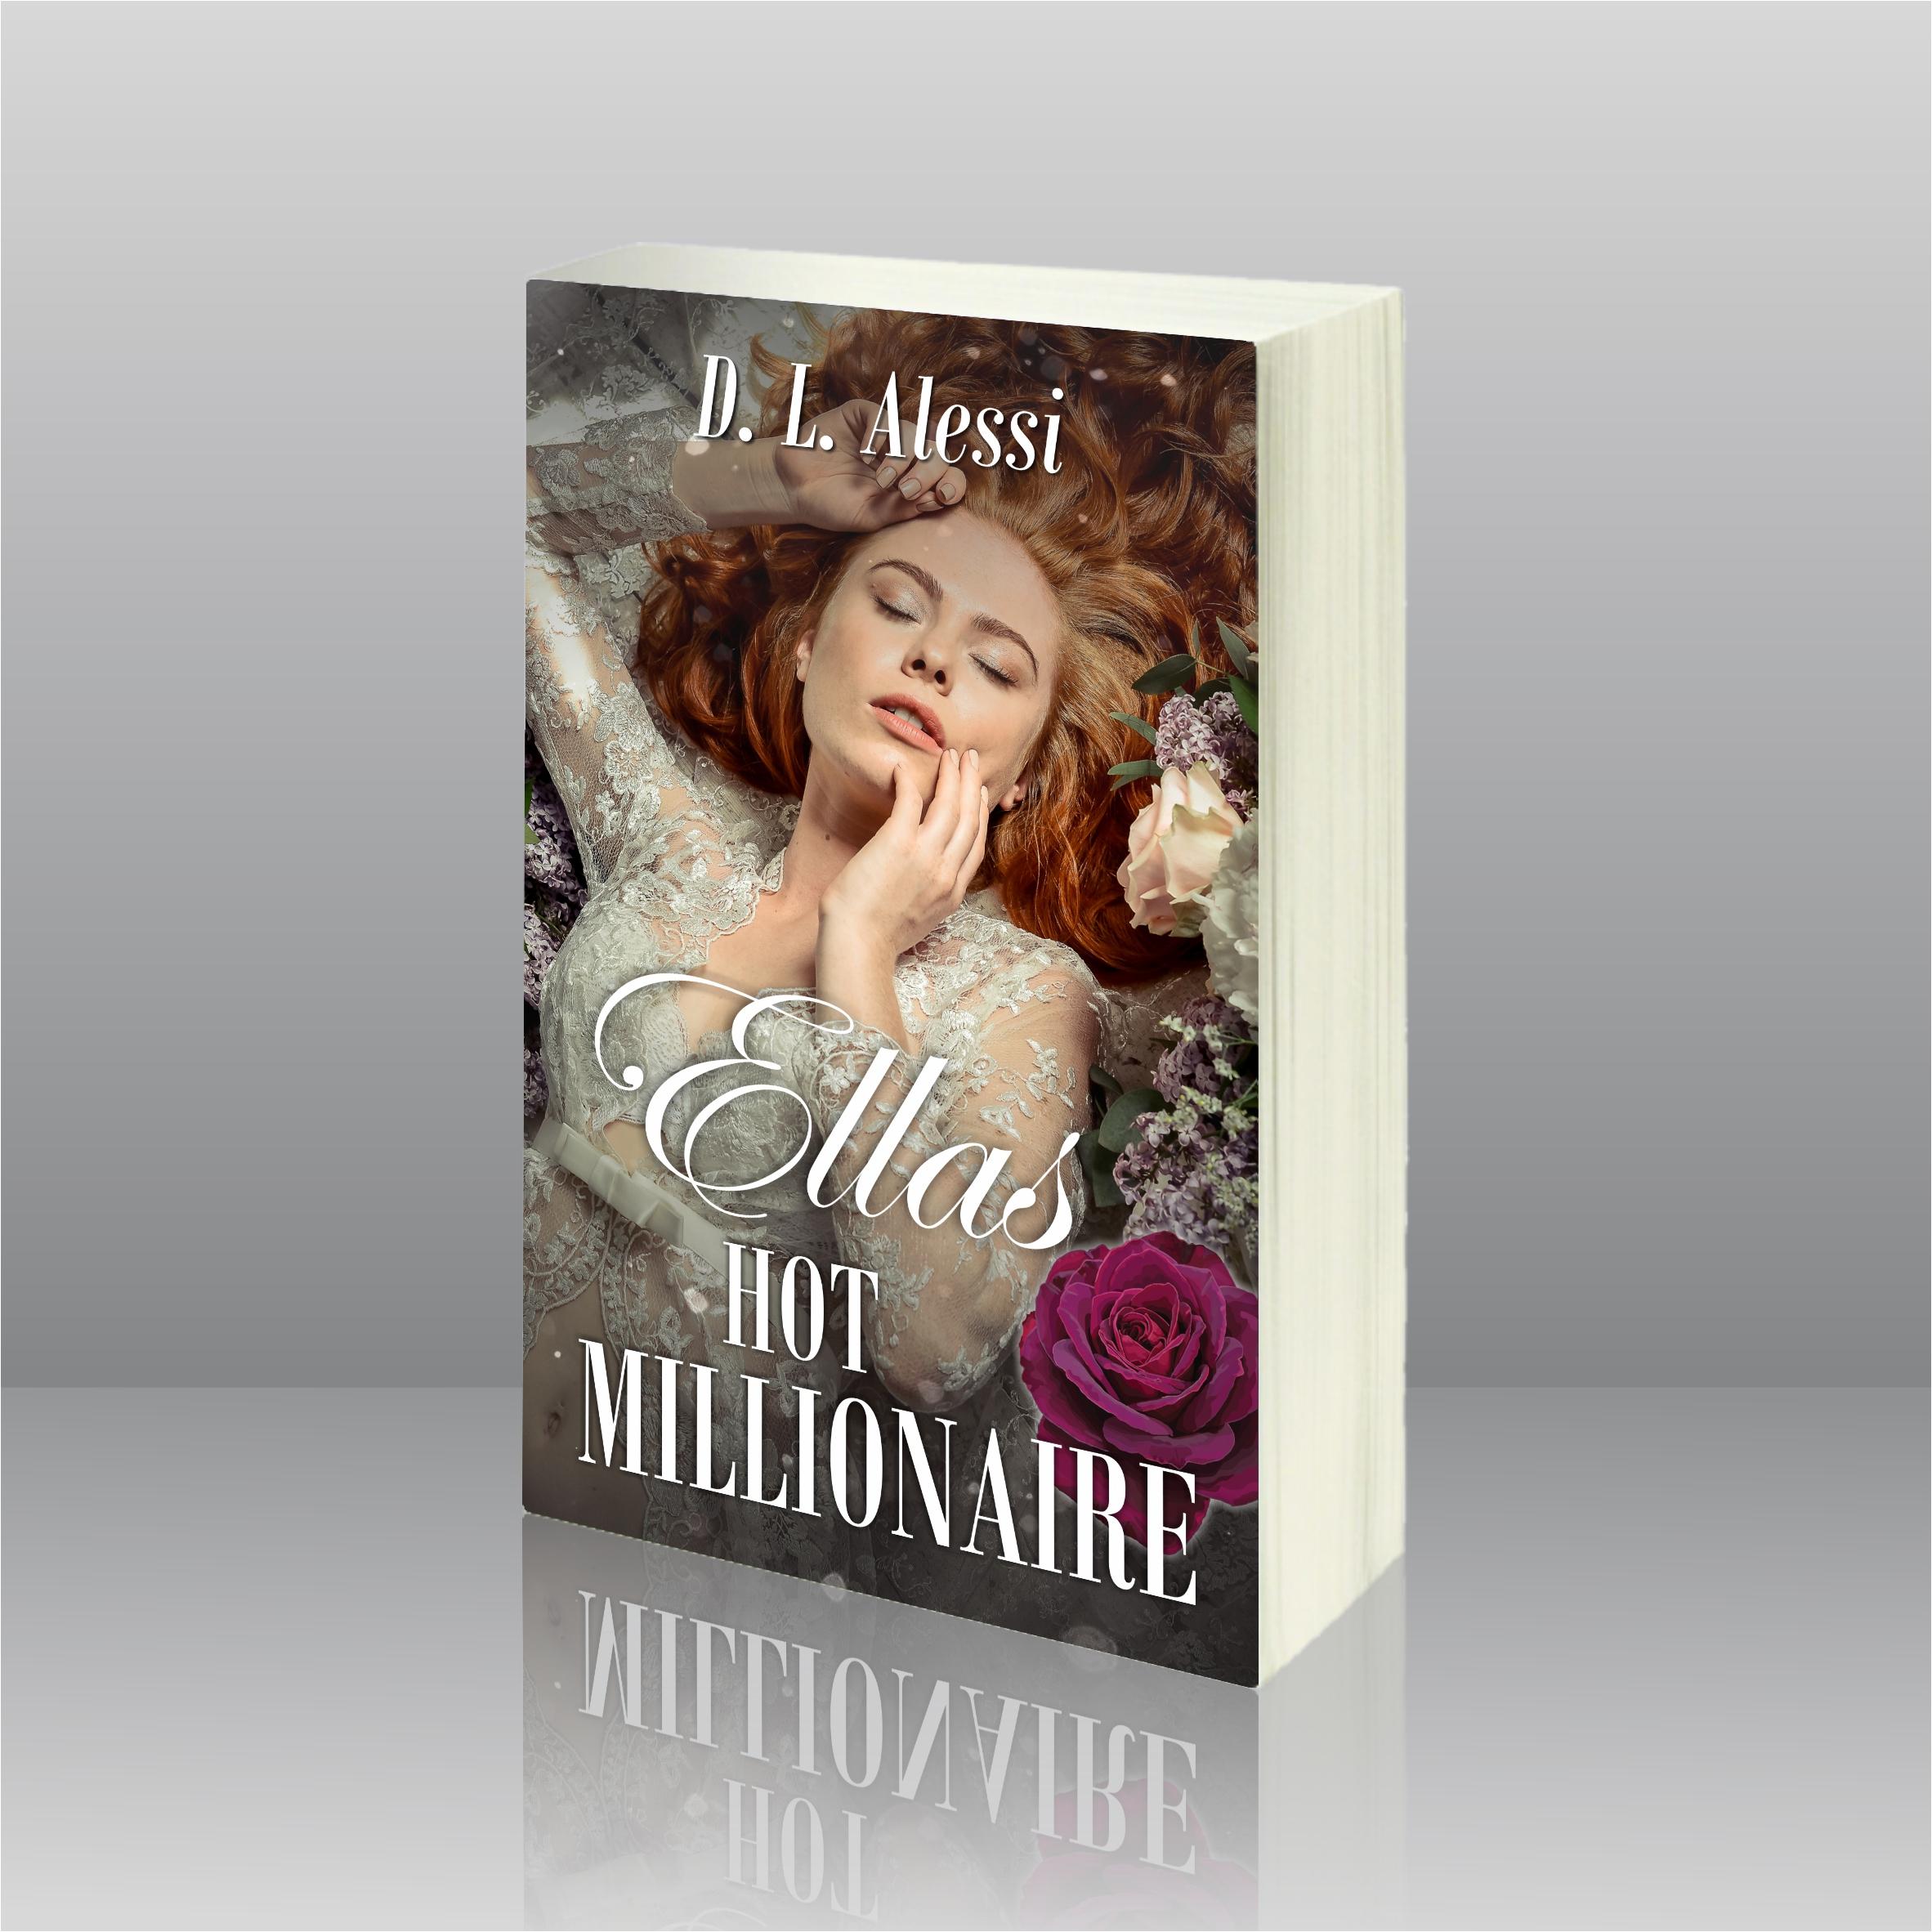 Cover D. L. Alessi Ellas Hot Millionaire